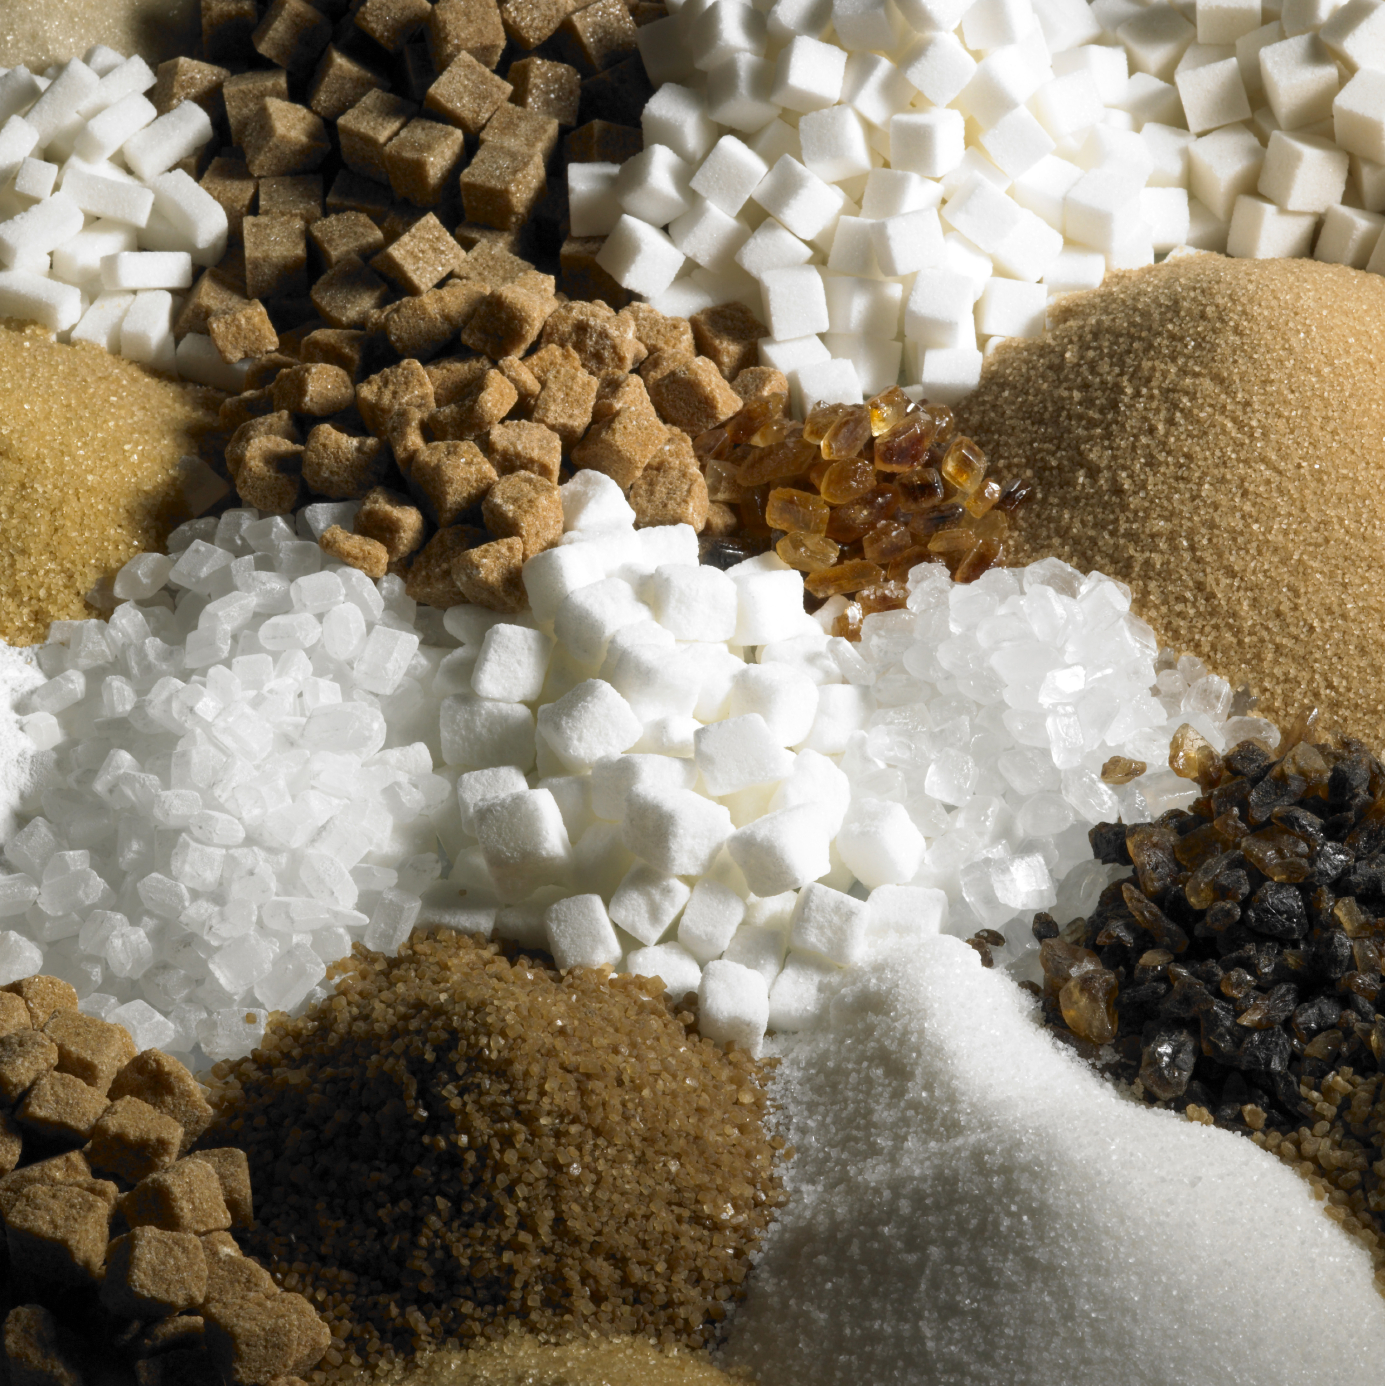 brown-white-sugar-stock-photo.jpg